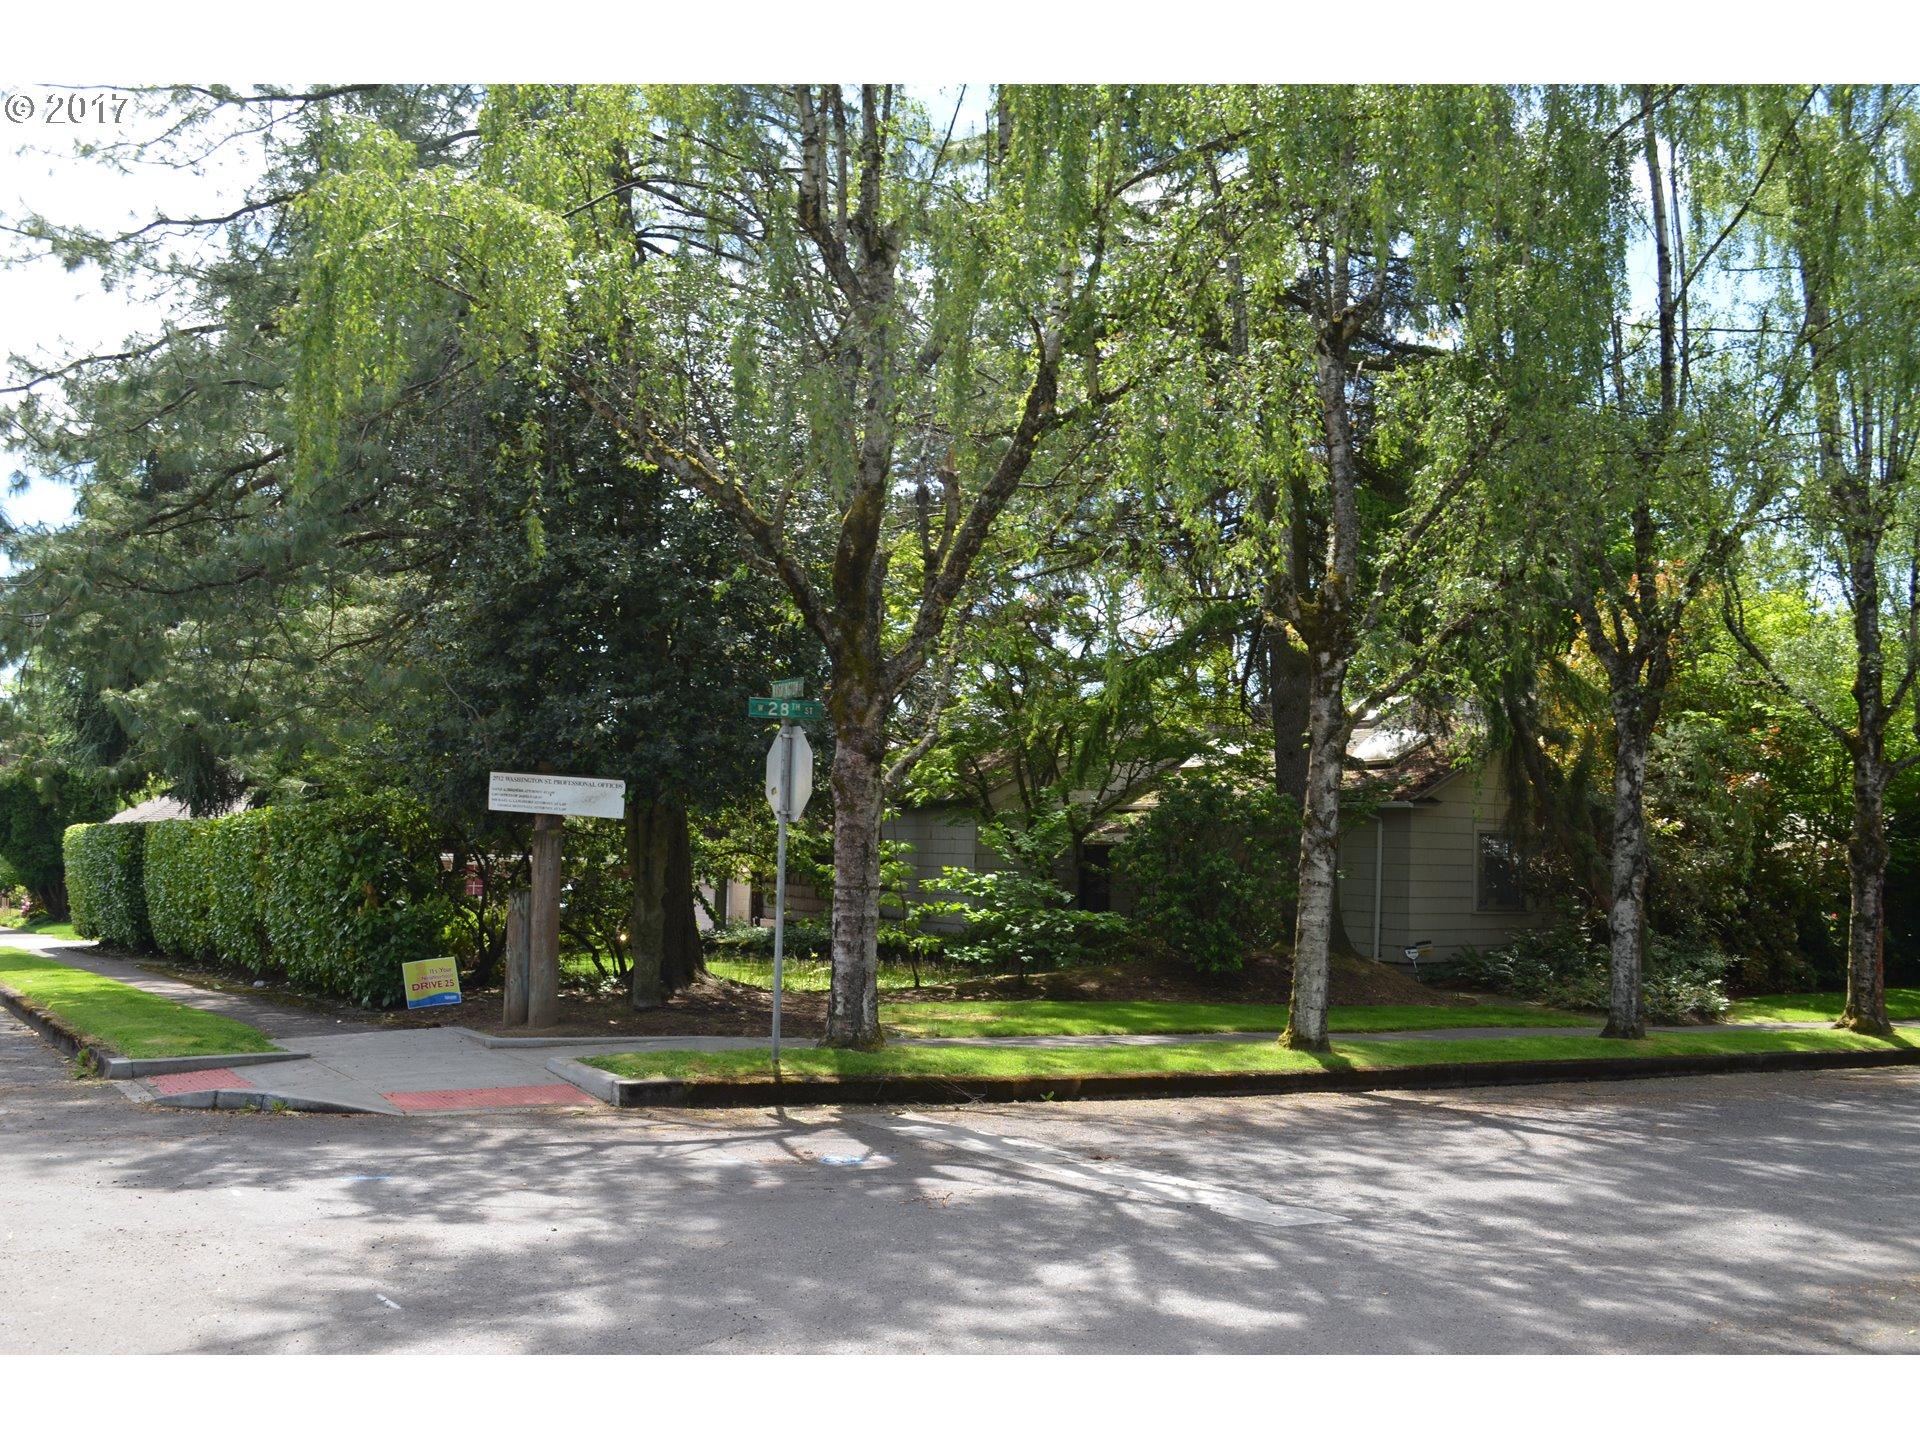 2712 WASHINGTON ST, Vancouver, WA 98660